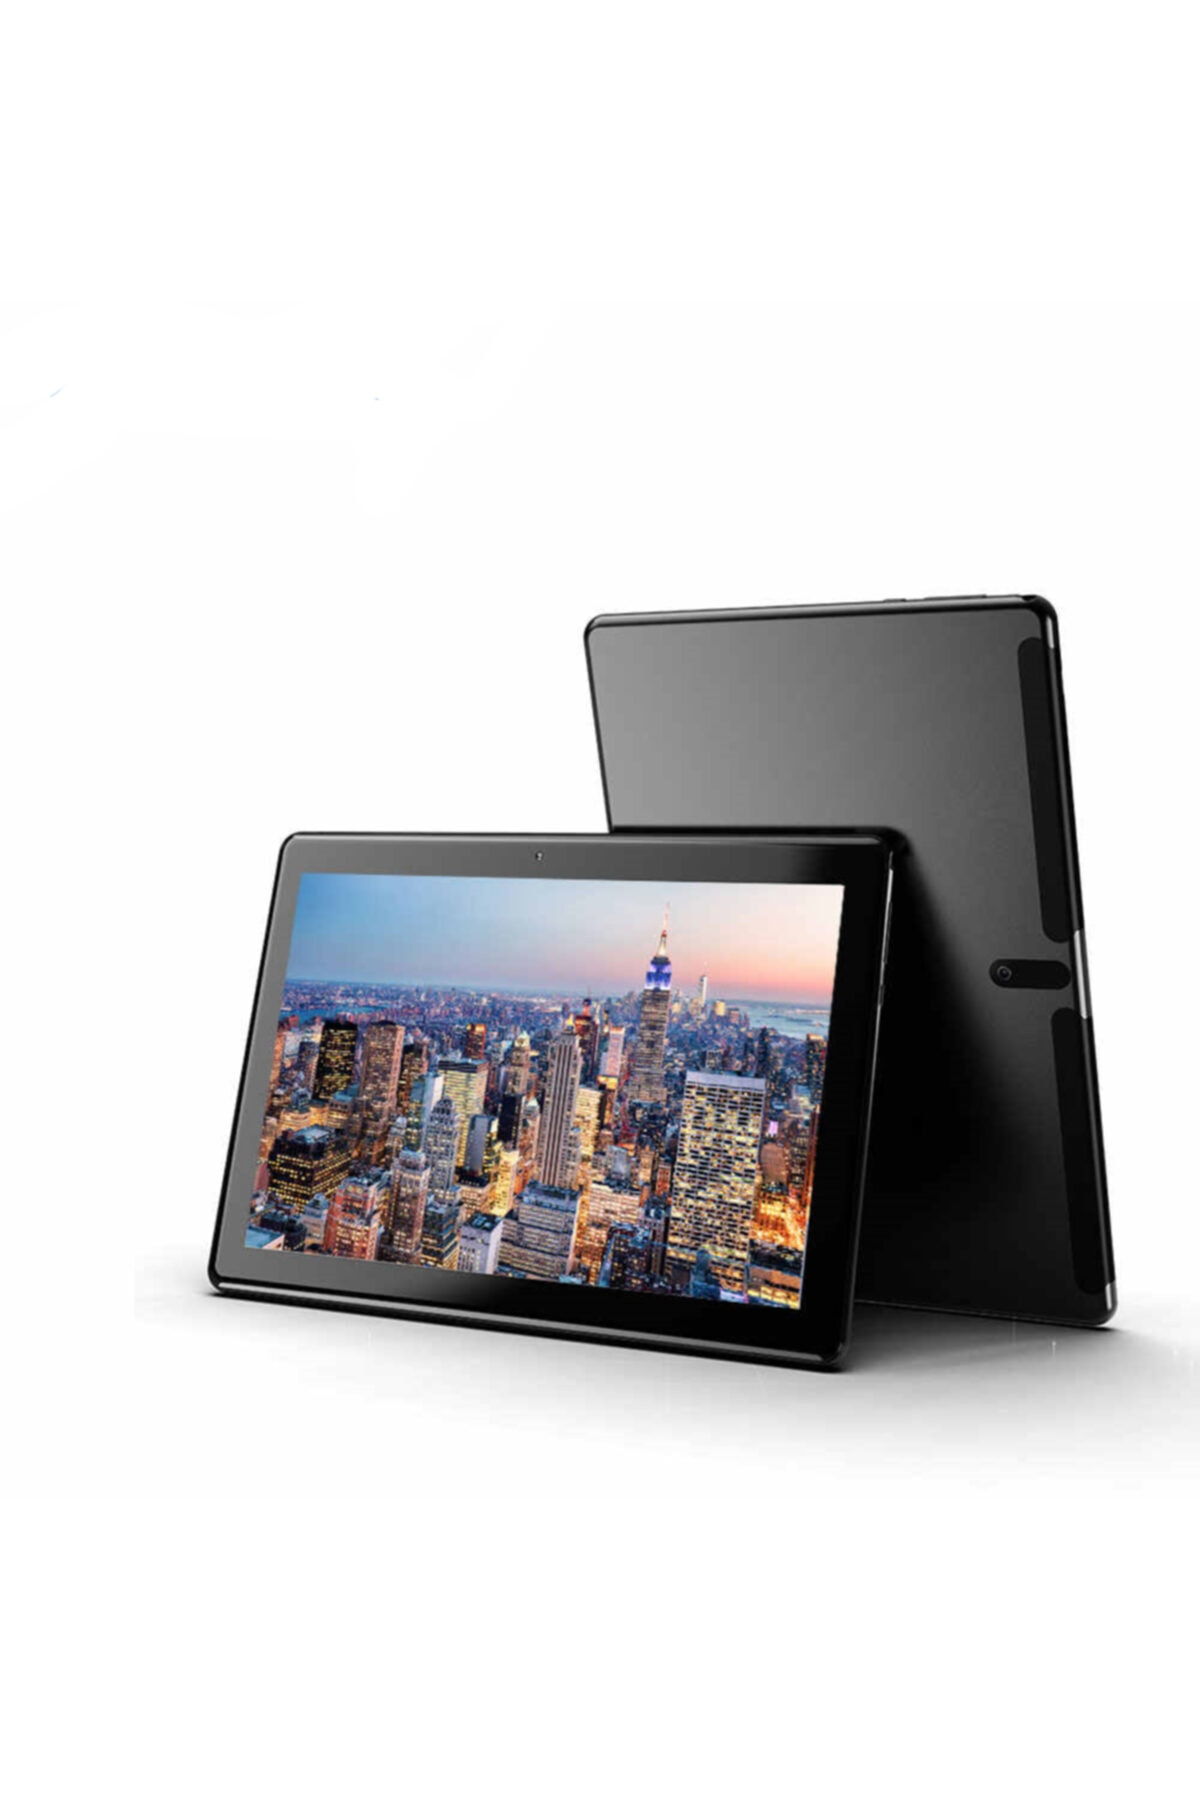 New Tablet M9 Pro/s410j 10.1 Inç Android Ram 4gb Rem 64gb Google Game  Bluetooth 1920x1200 Tablet Pc M-9 PRO